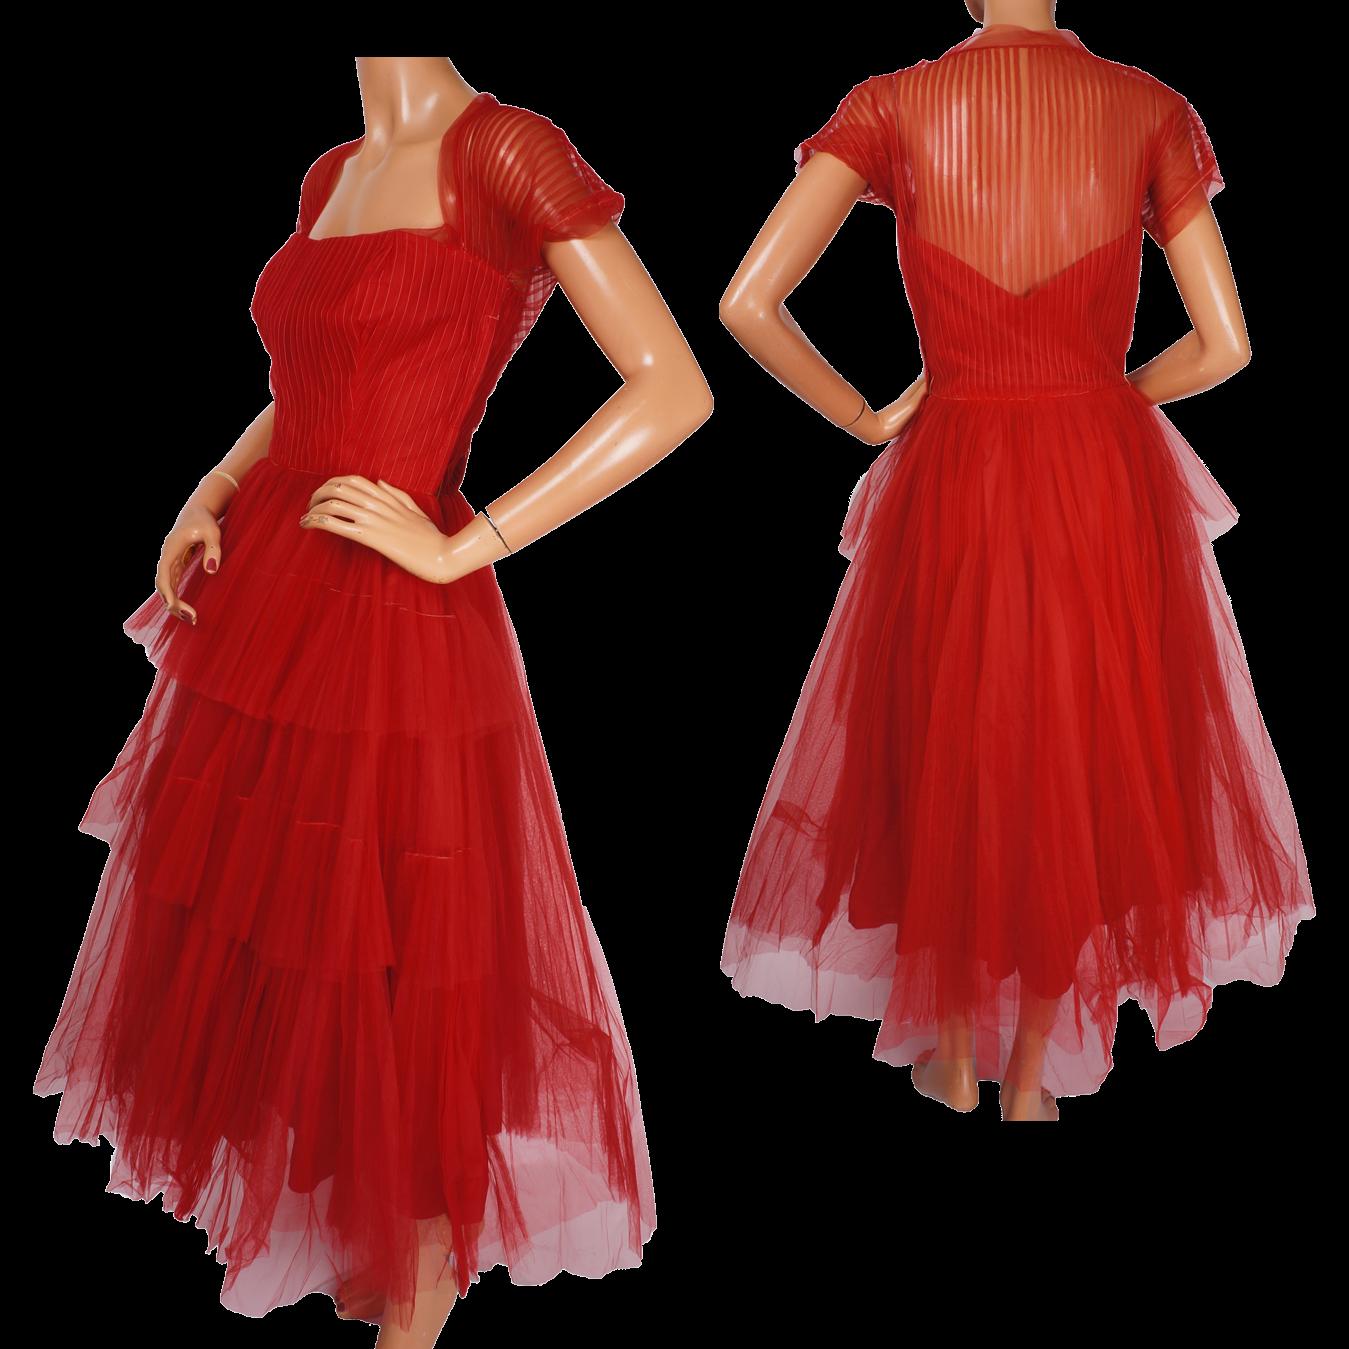 Saks 5th Avenue Prom Dresses - Short Hair Fashions